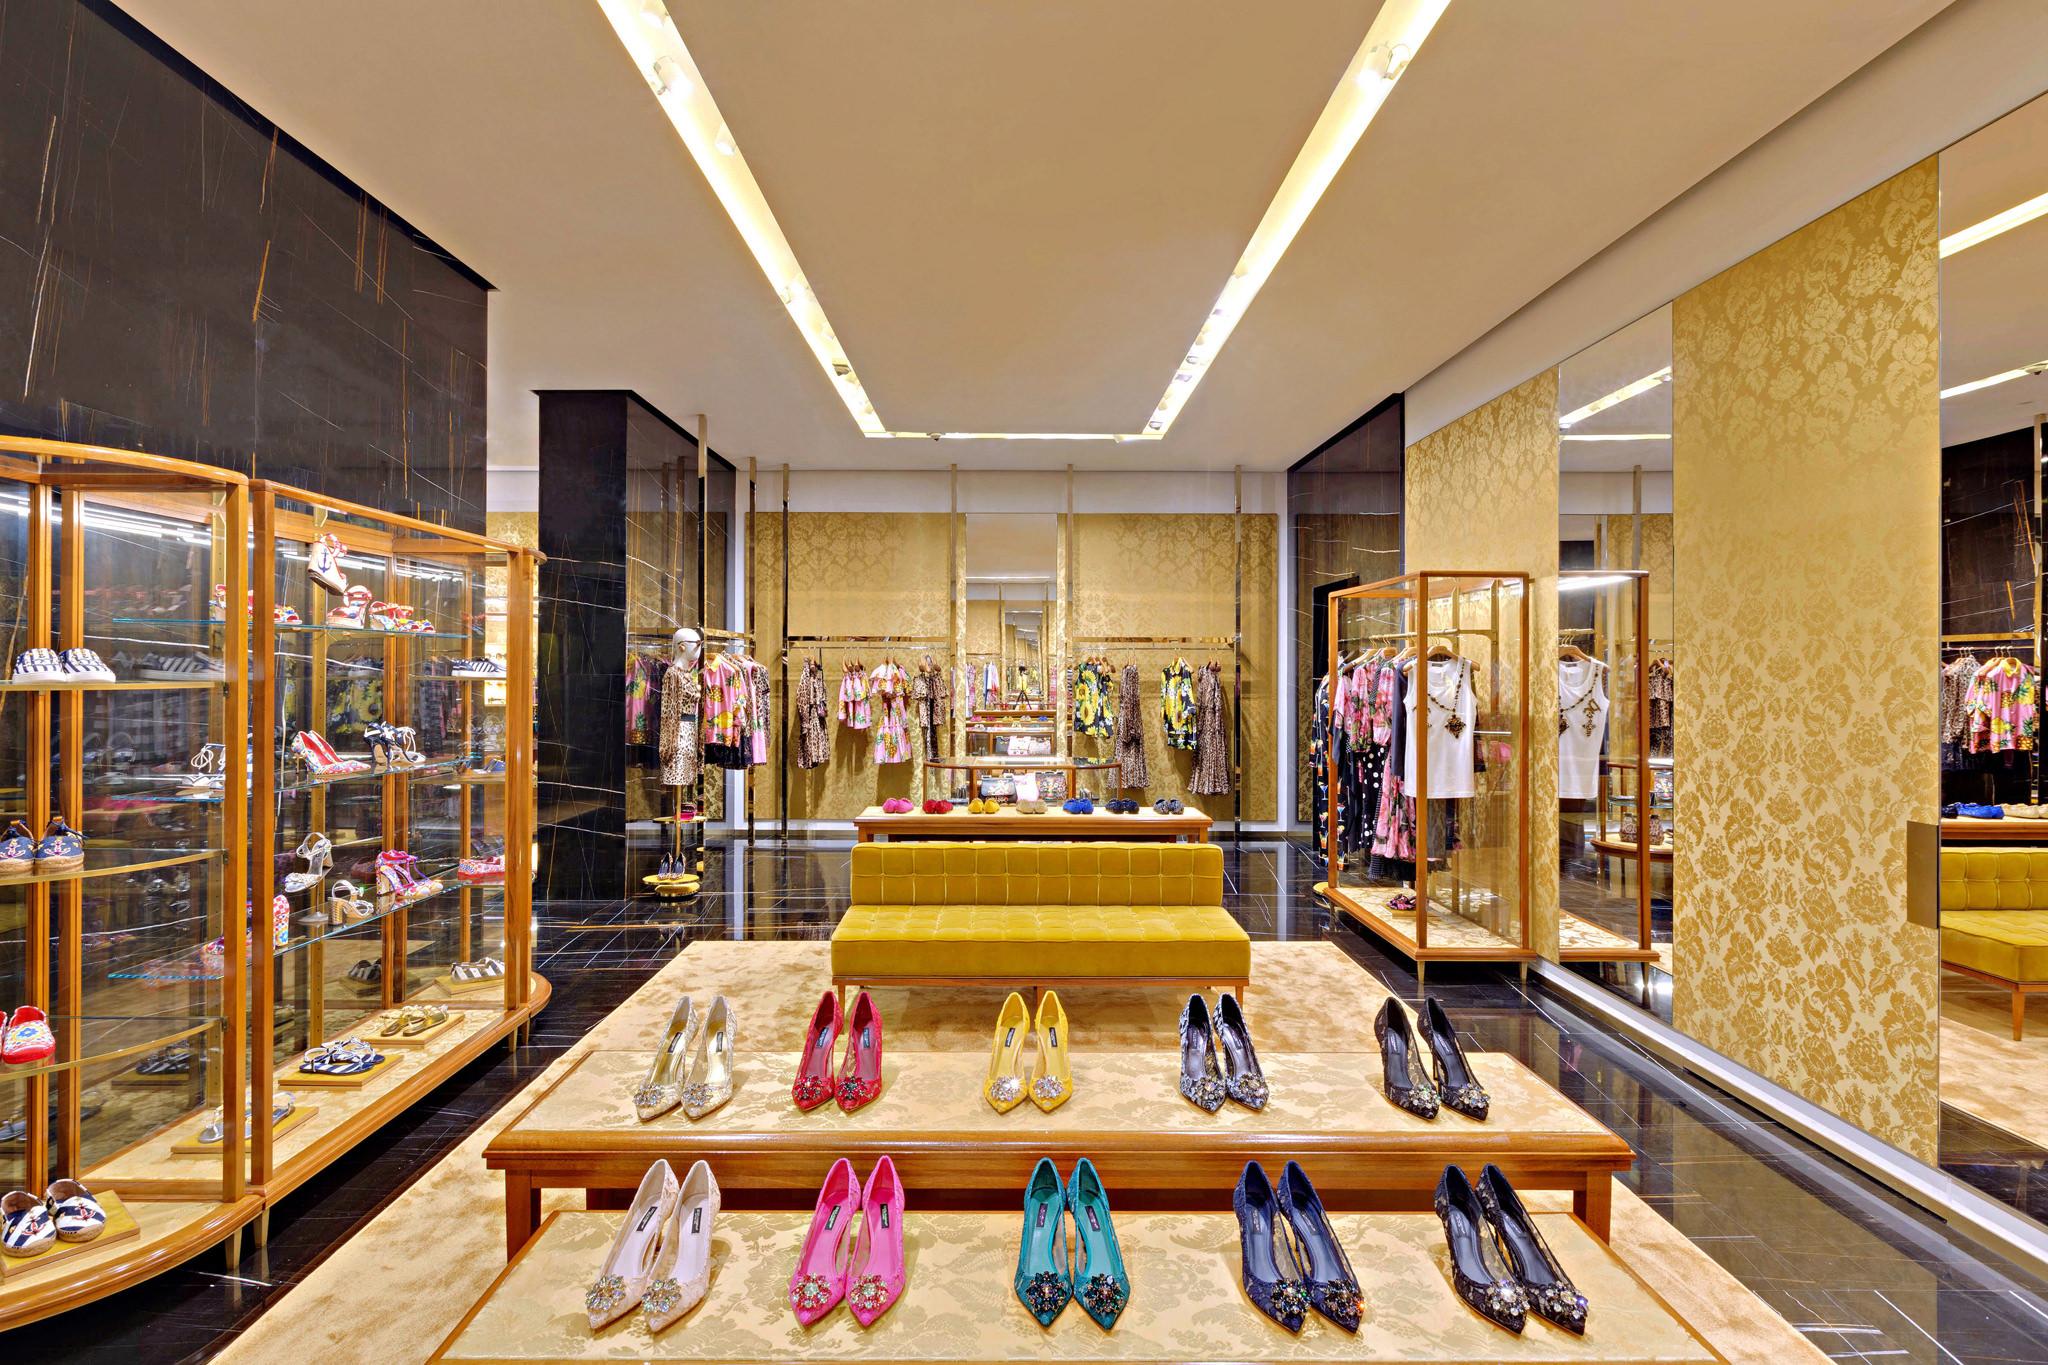 20170519 - Dolce & Gabbana - HCM - Commercial - Interior - Store - Retouch 0004.jpg